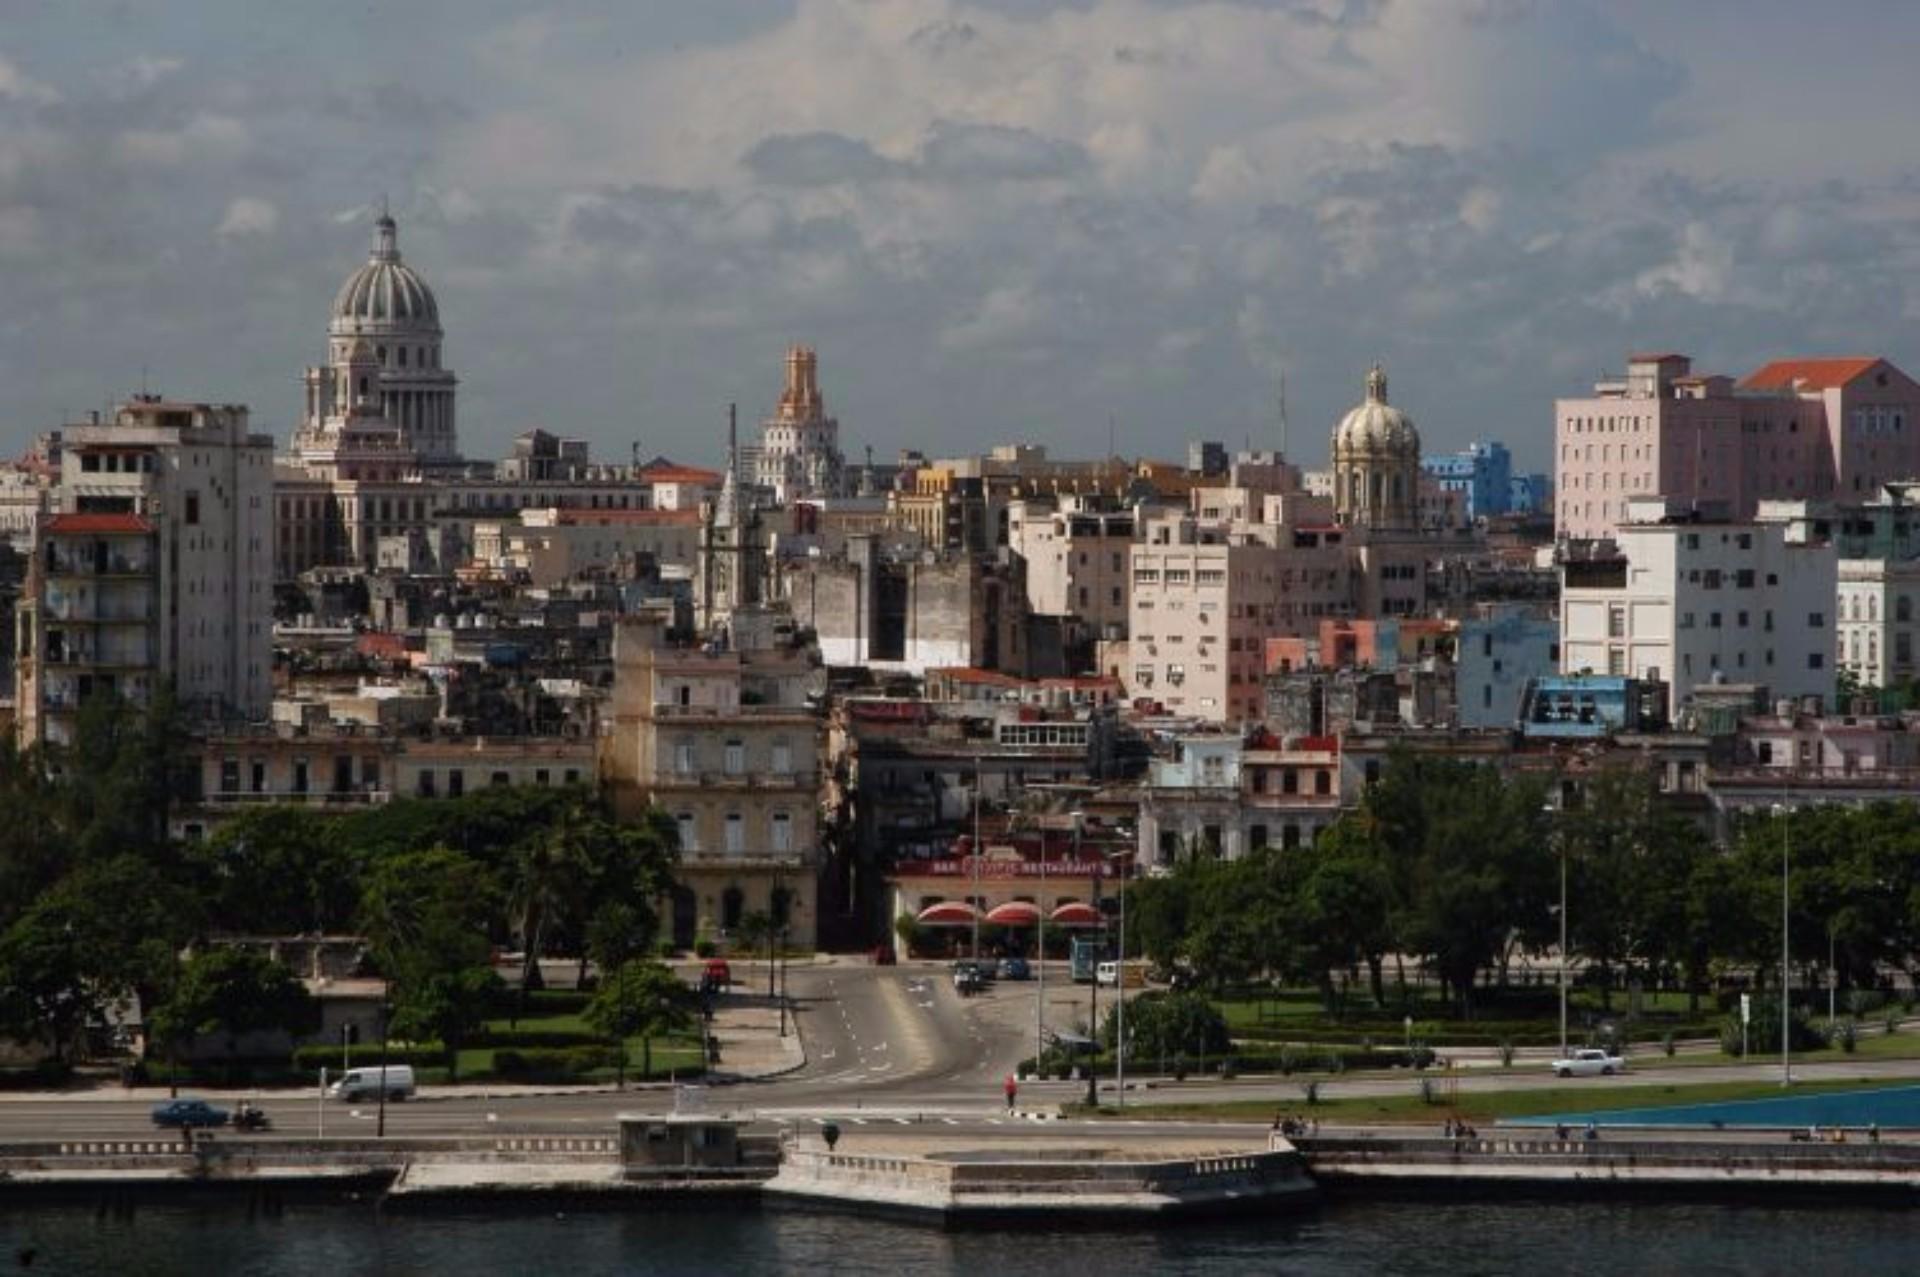 Cuba Population in 2017